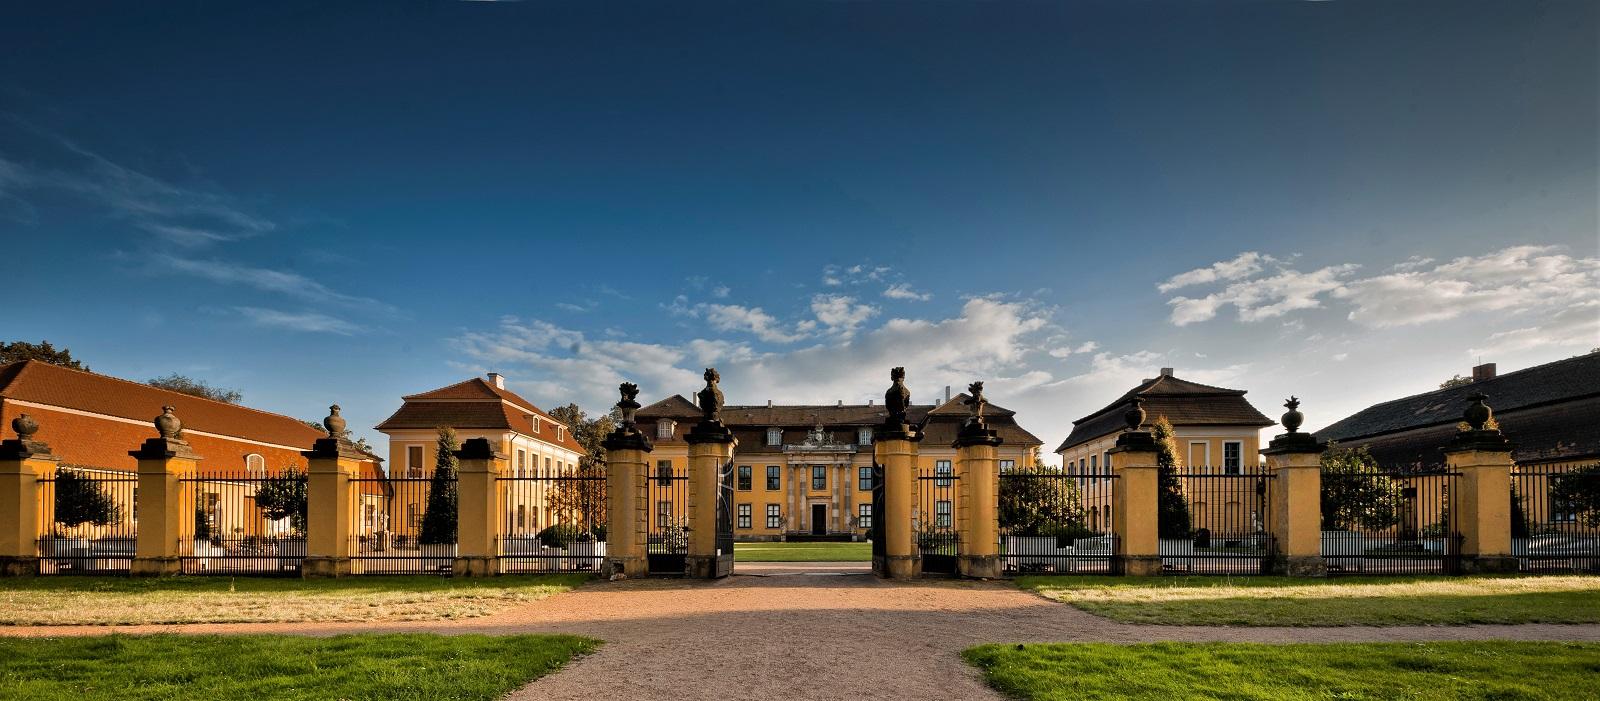 Gartenreich Welterbe – Schloss Mosigkau